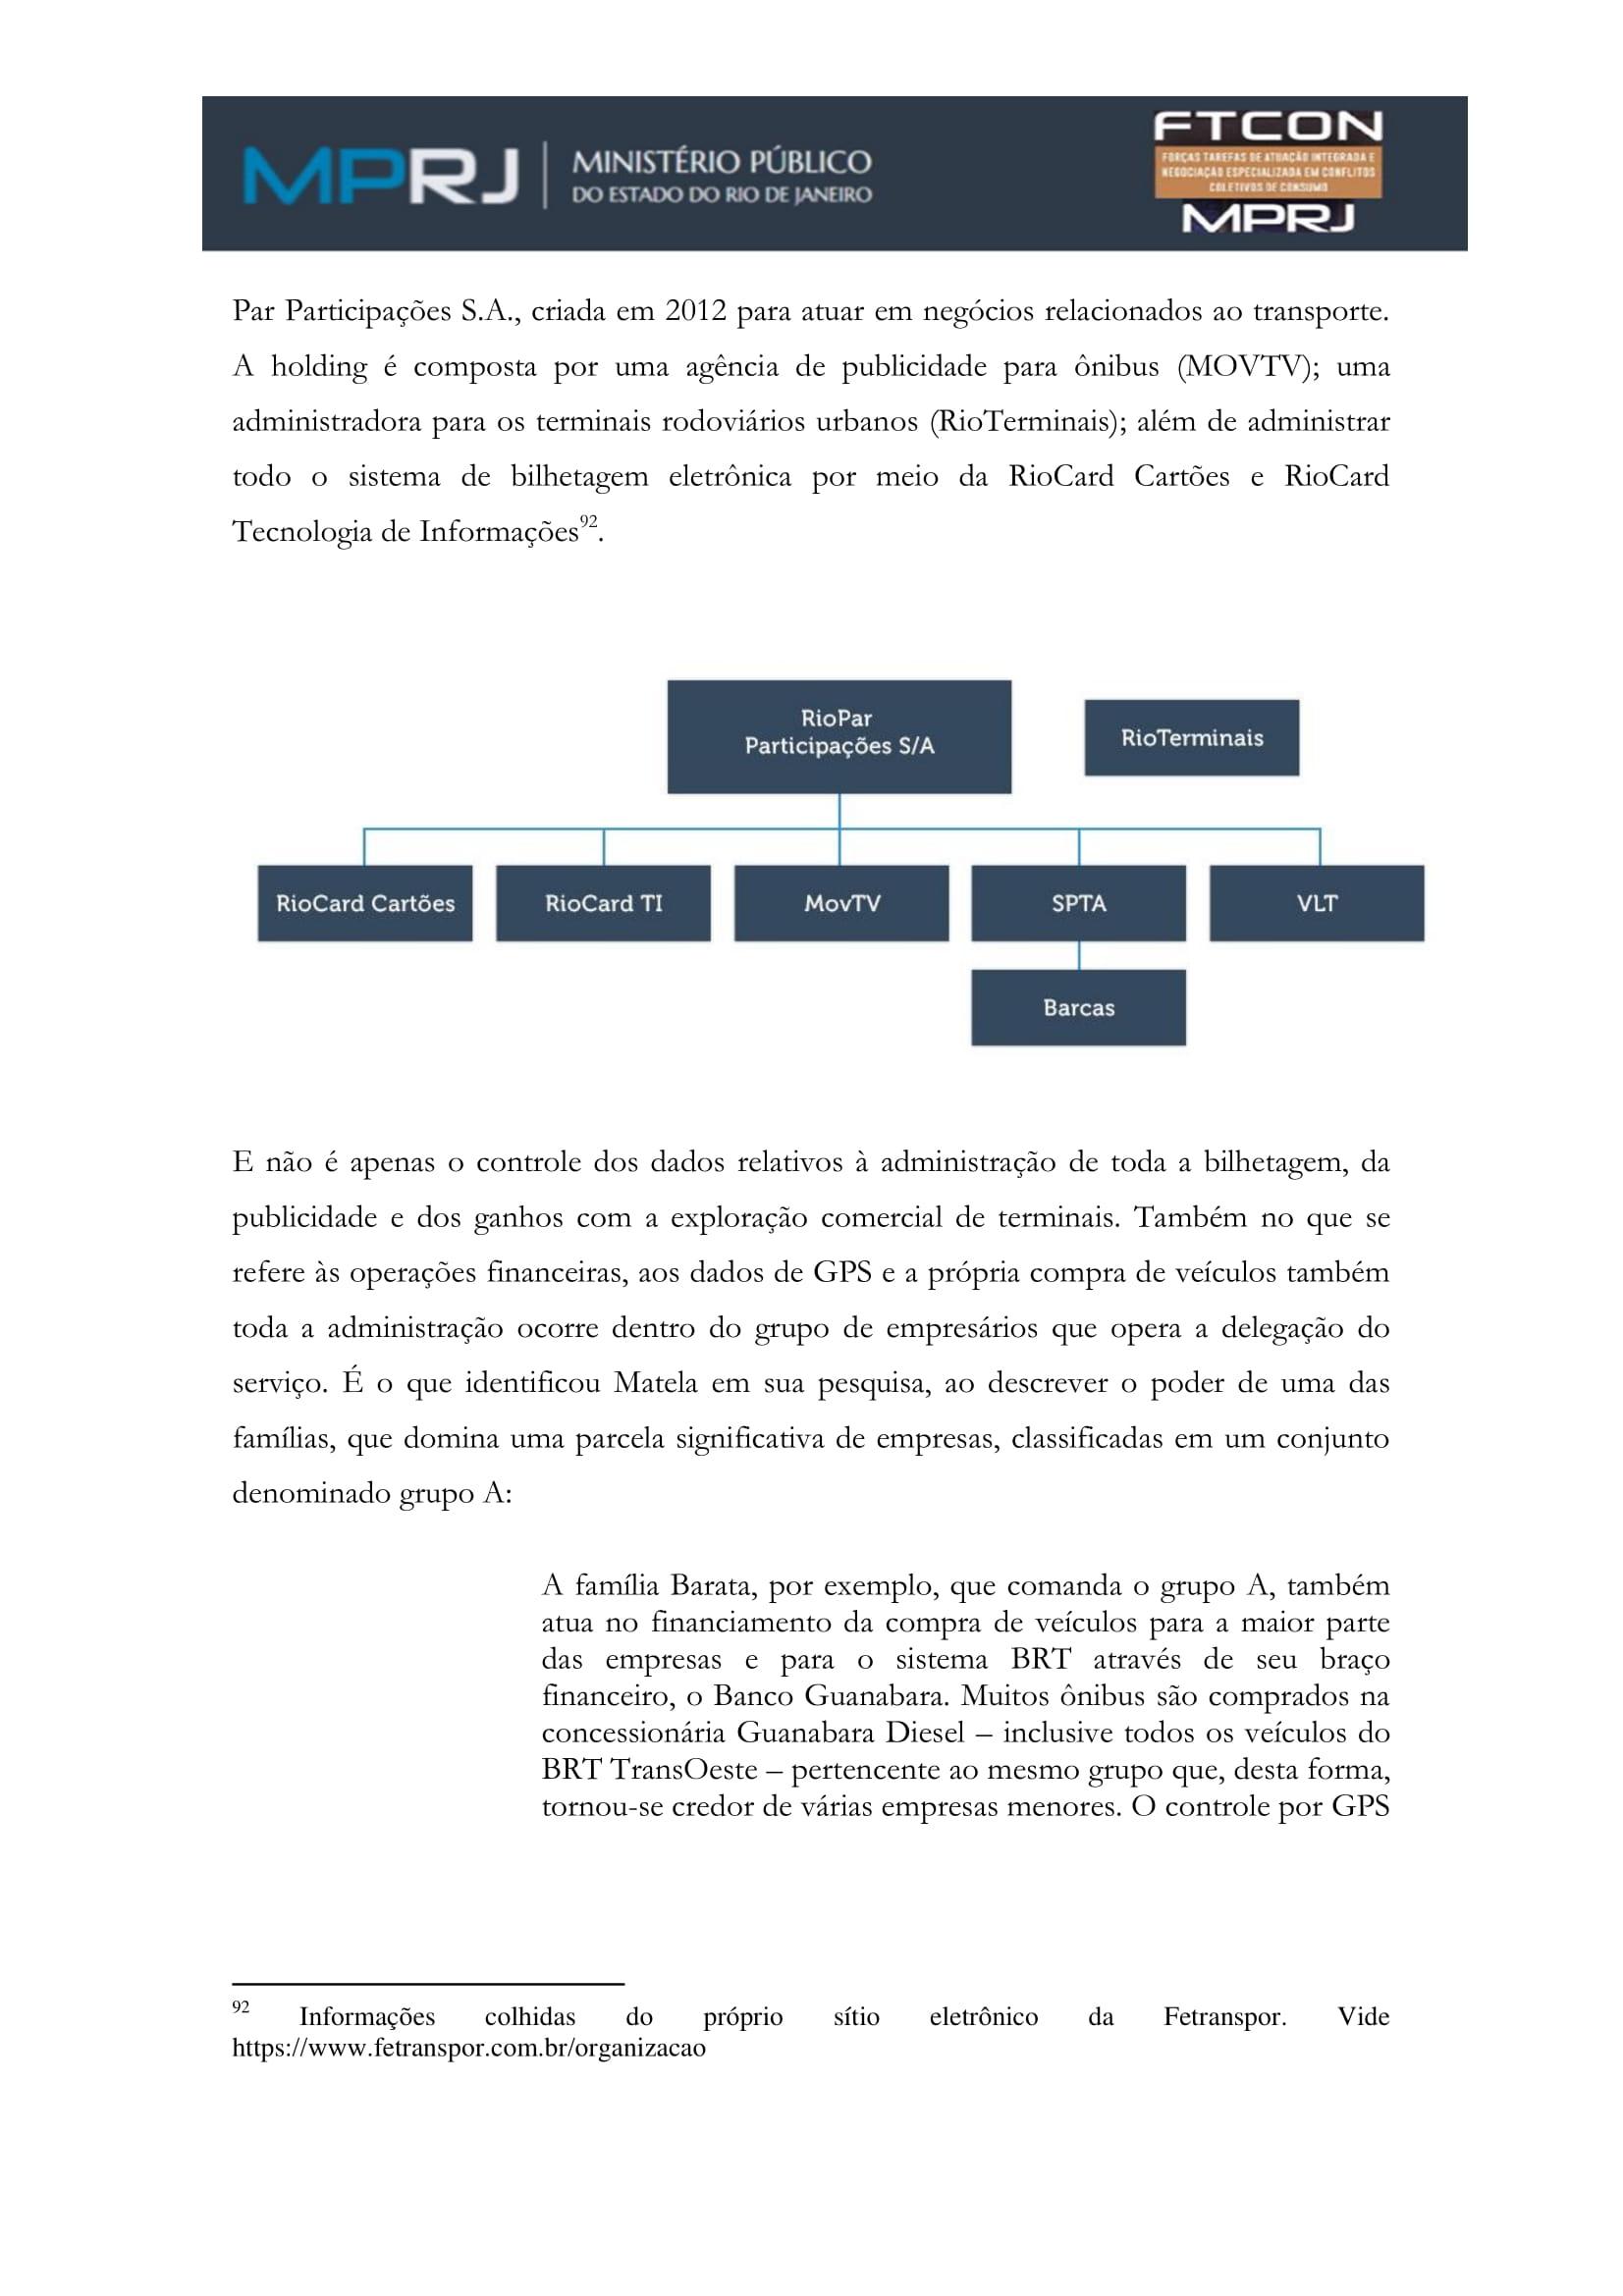 acp_caducidade_onibus_dr_rt-103